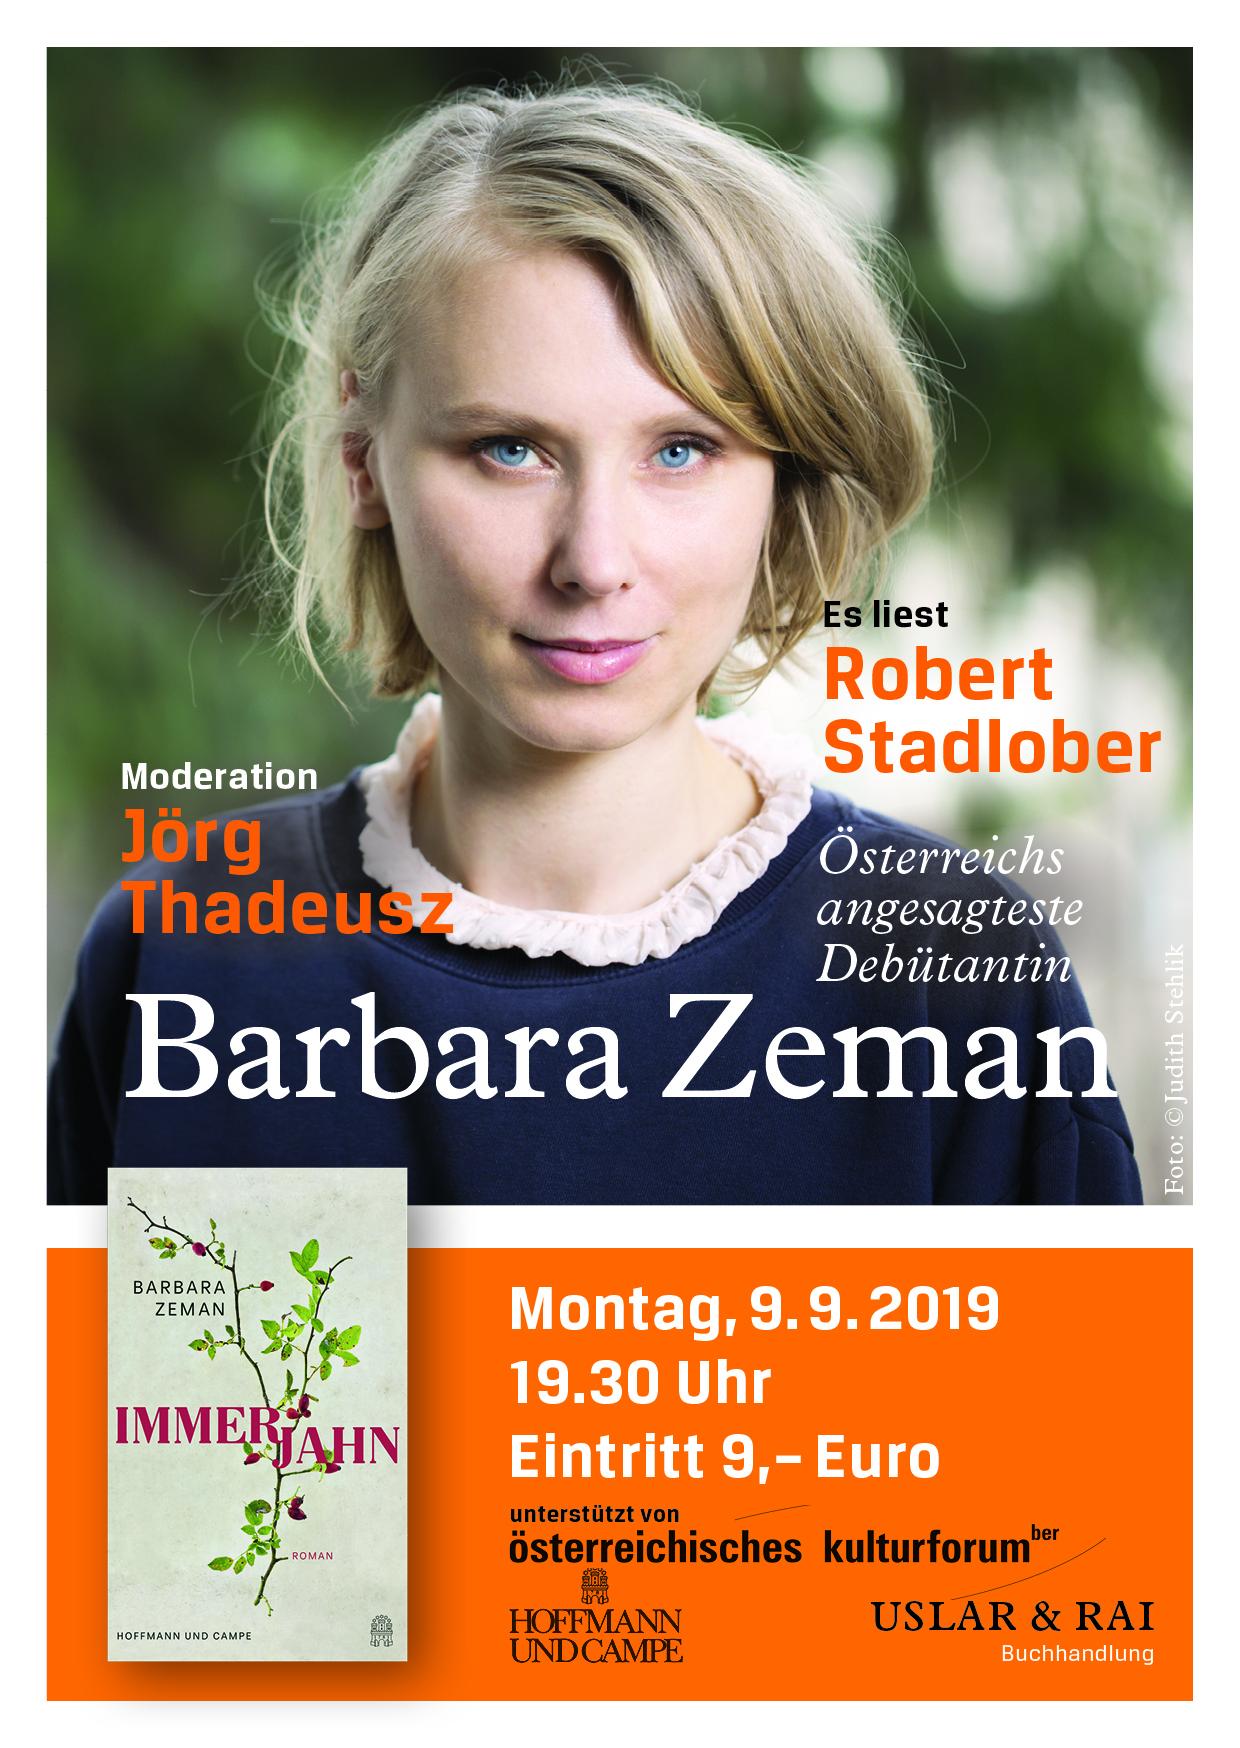 Immerjahn Mit Barbara Zeman Robert Stadlober Und Jörg Thadeusz Uslar Rai